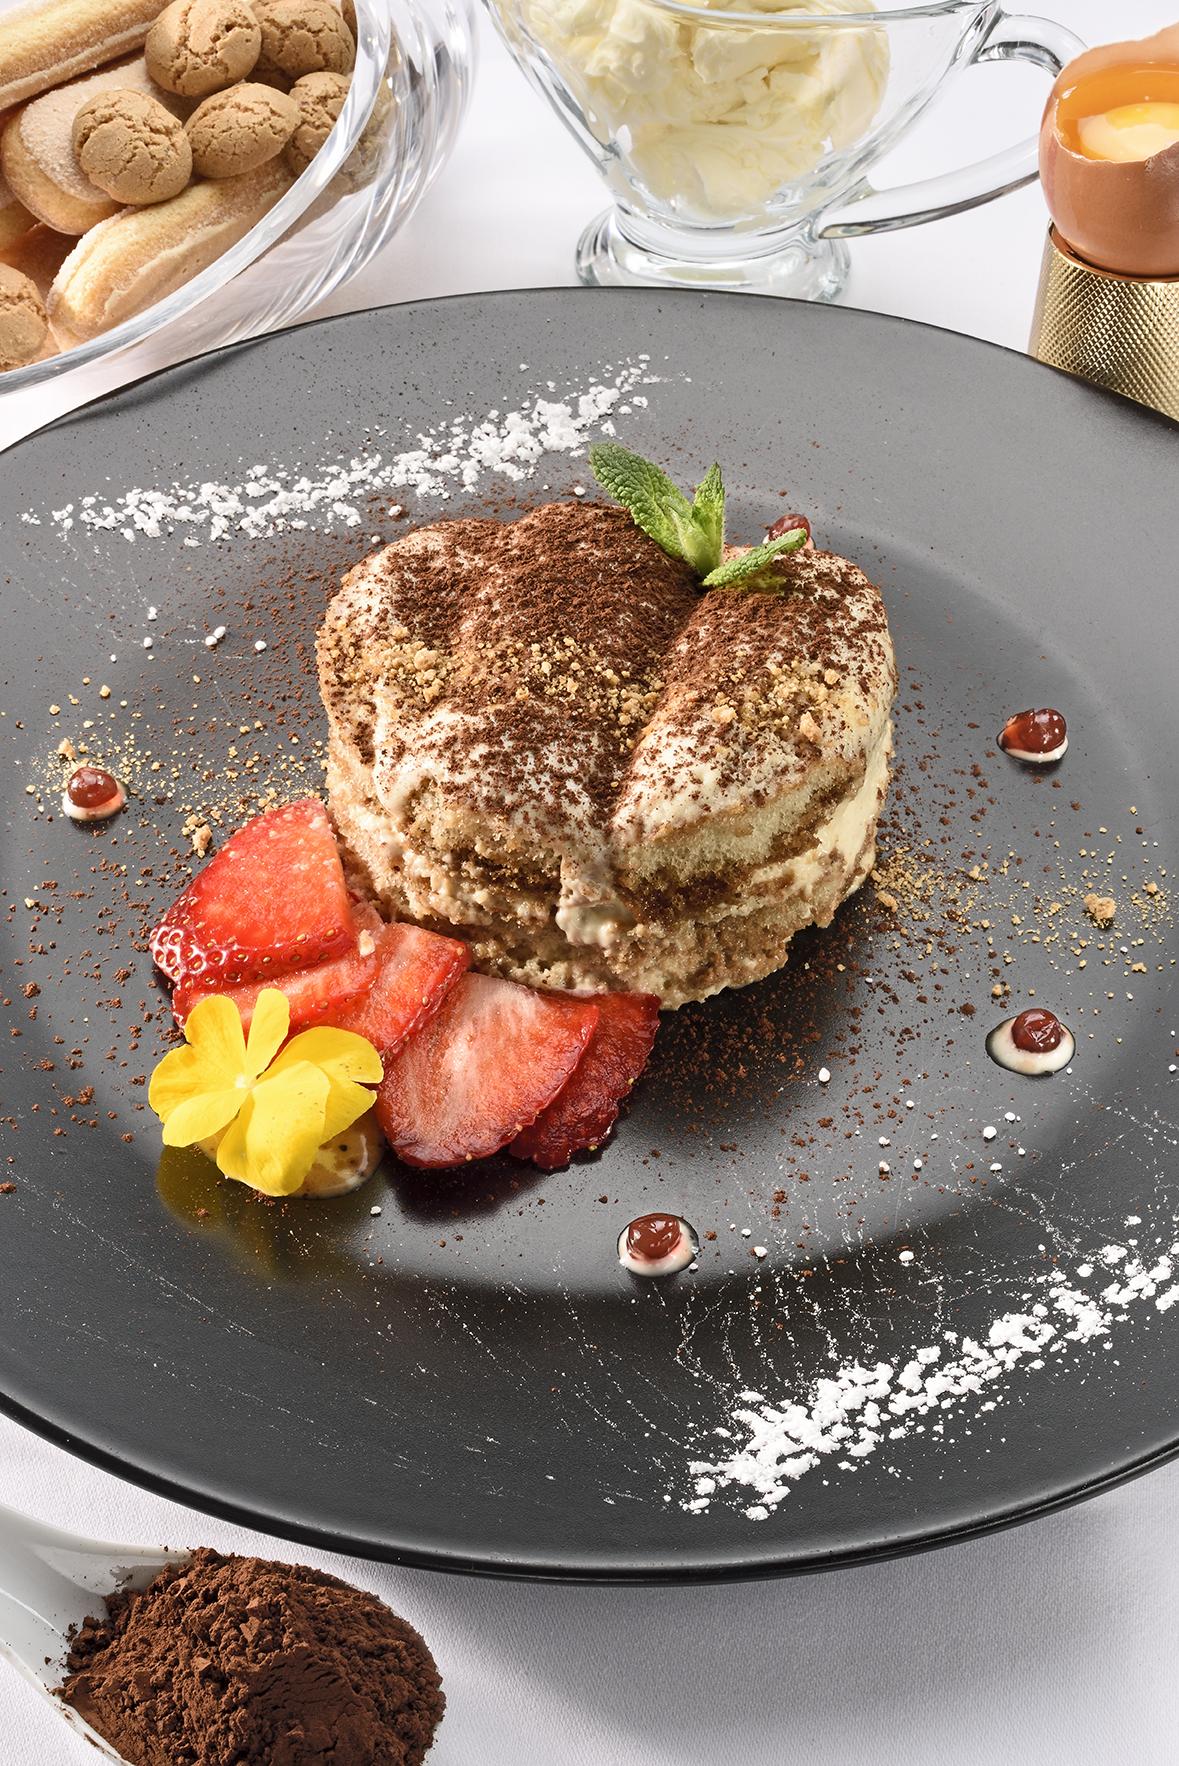 http://sandrorestaurante.com/wp-content/uploads/2017/01/piatto-065-1.jpg